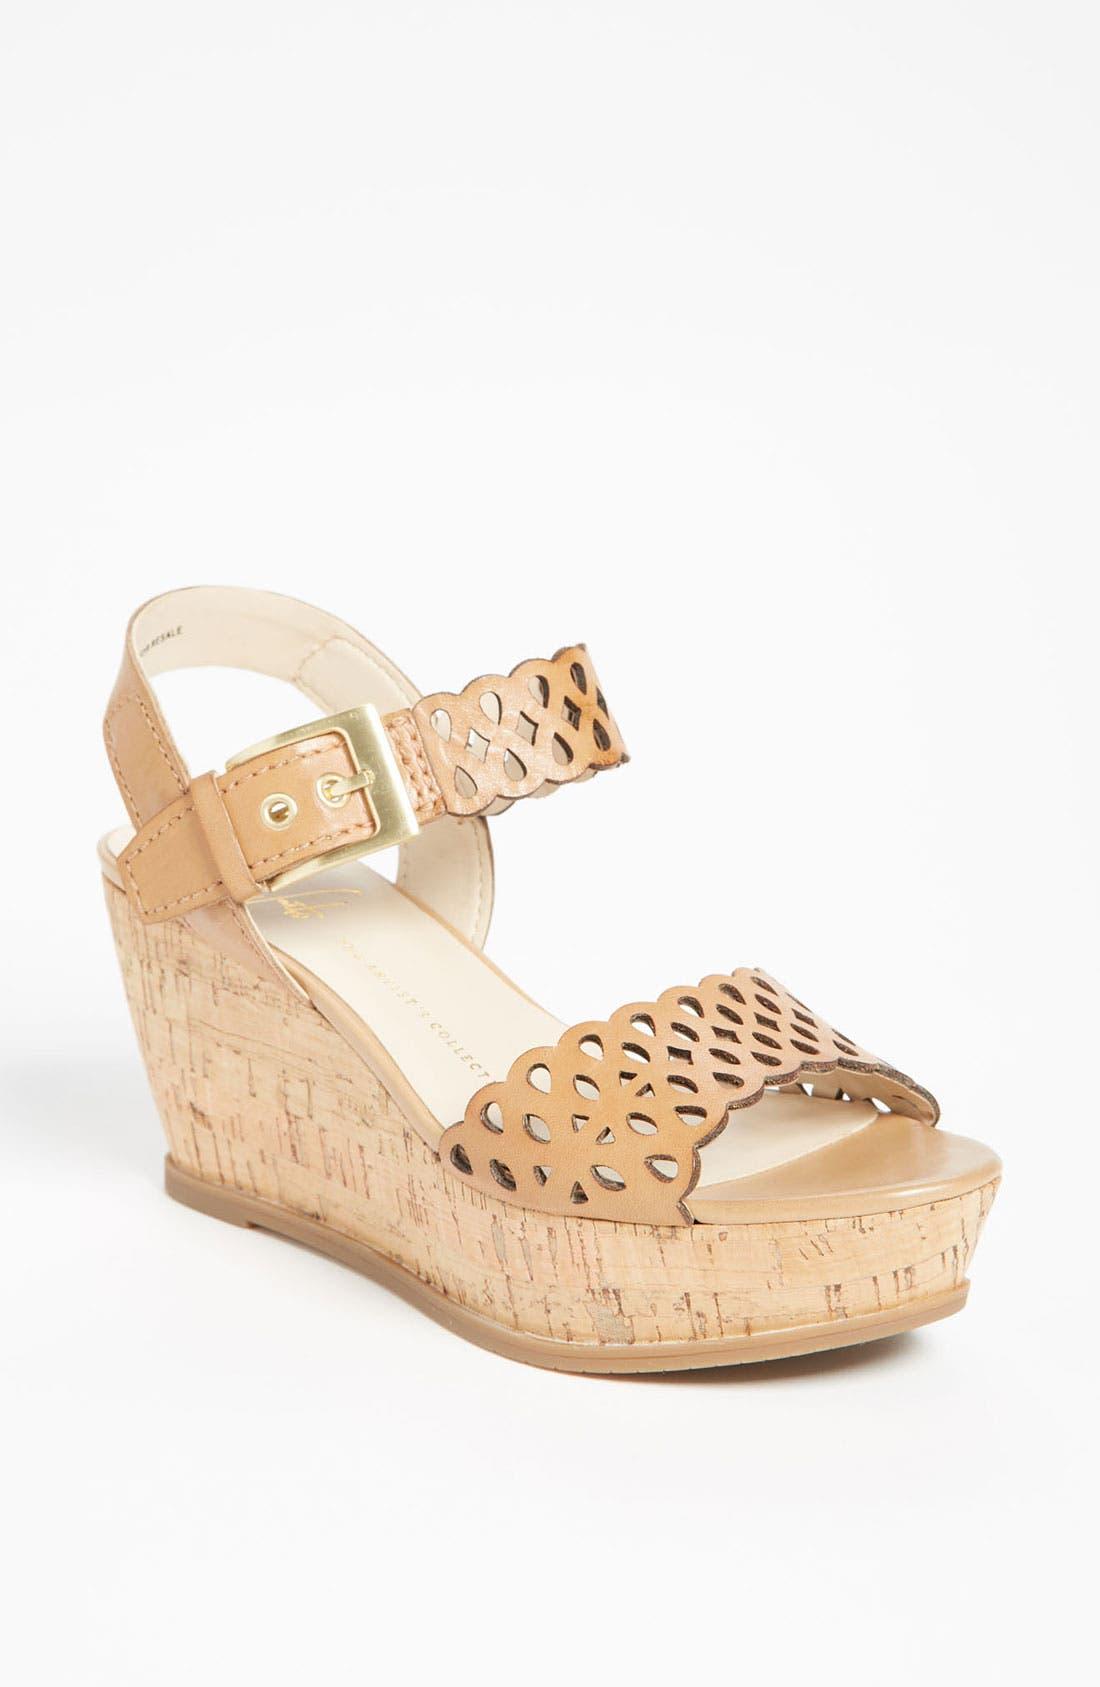 Main Image - Franco Sarto 'Fern' Sandal